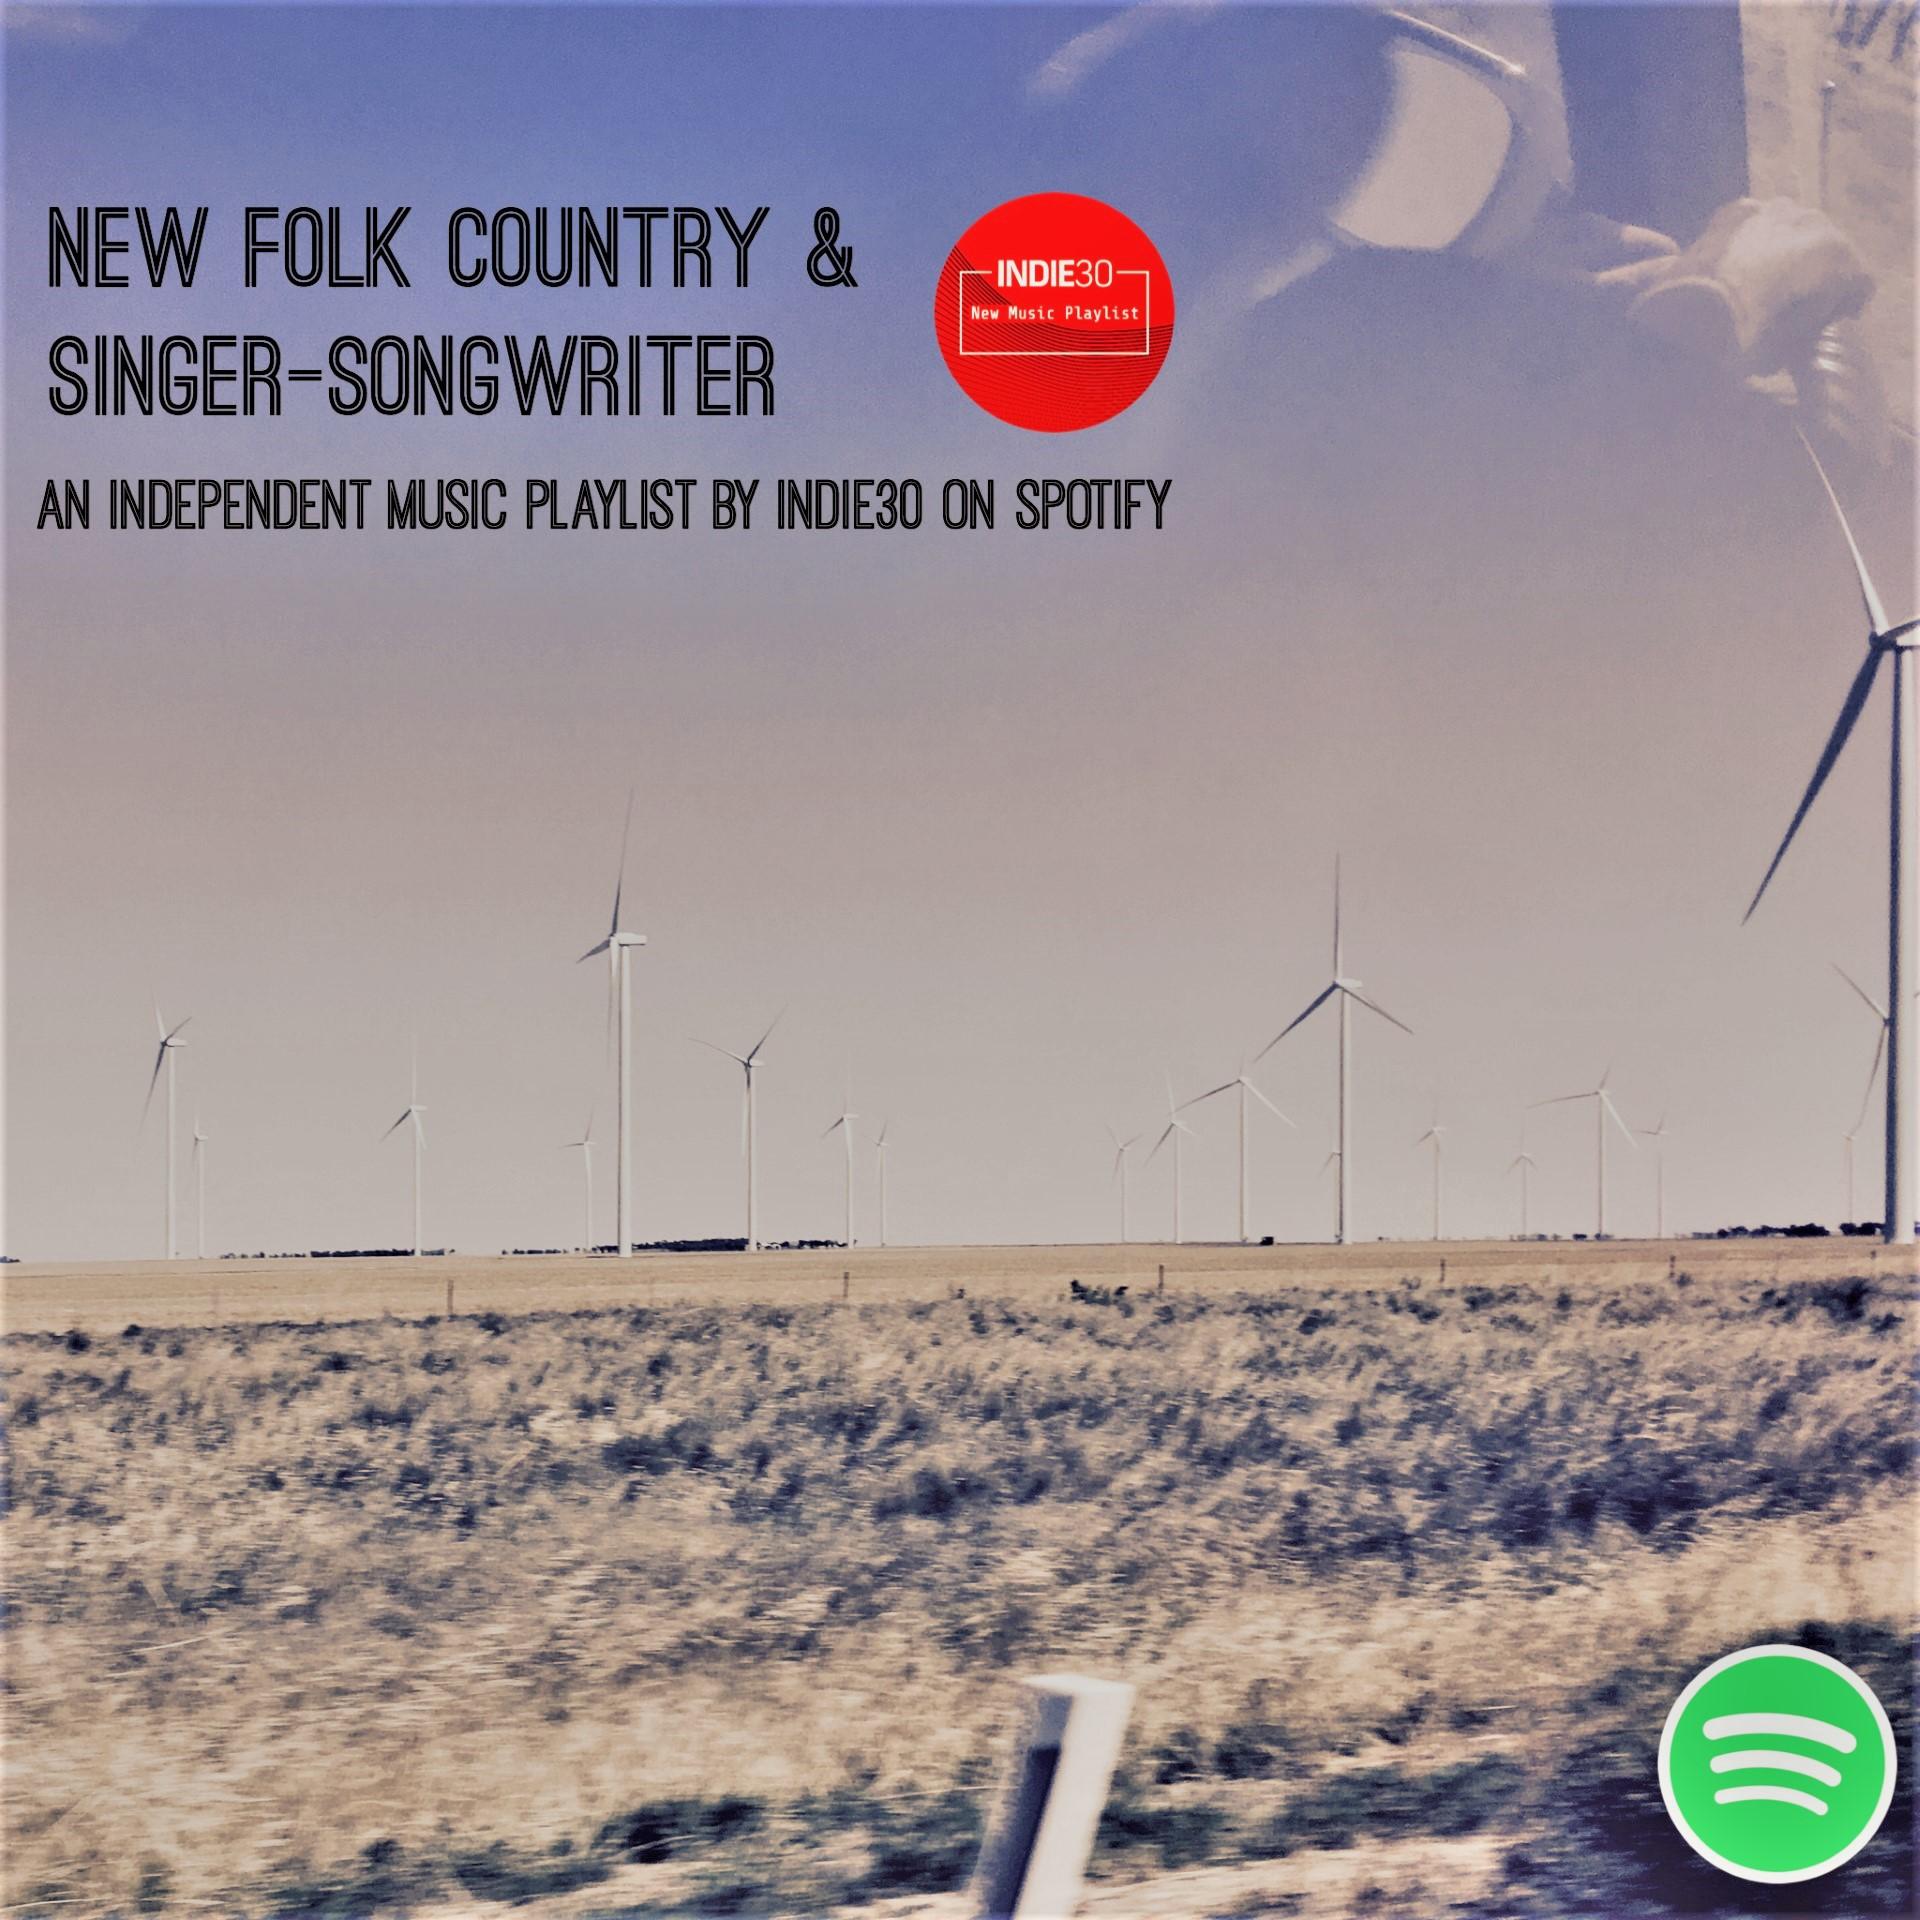 New-Folk-Country-Singer-Songwriter-Cover-Custom-1-Copy-Copy